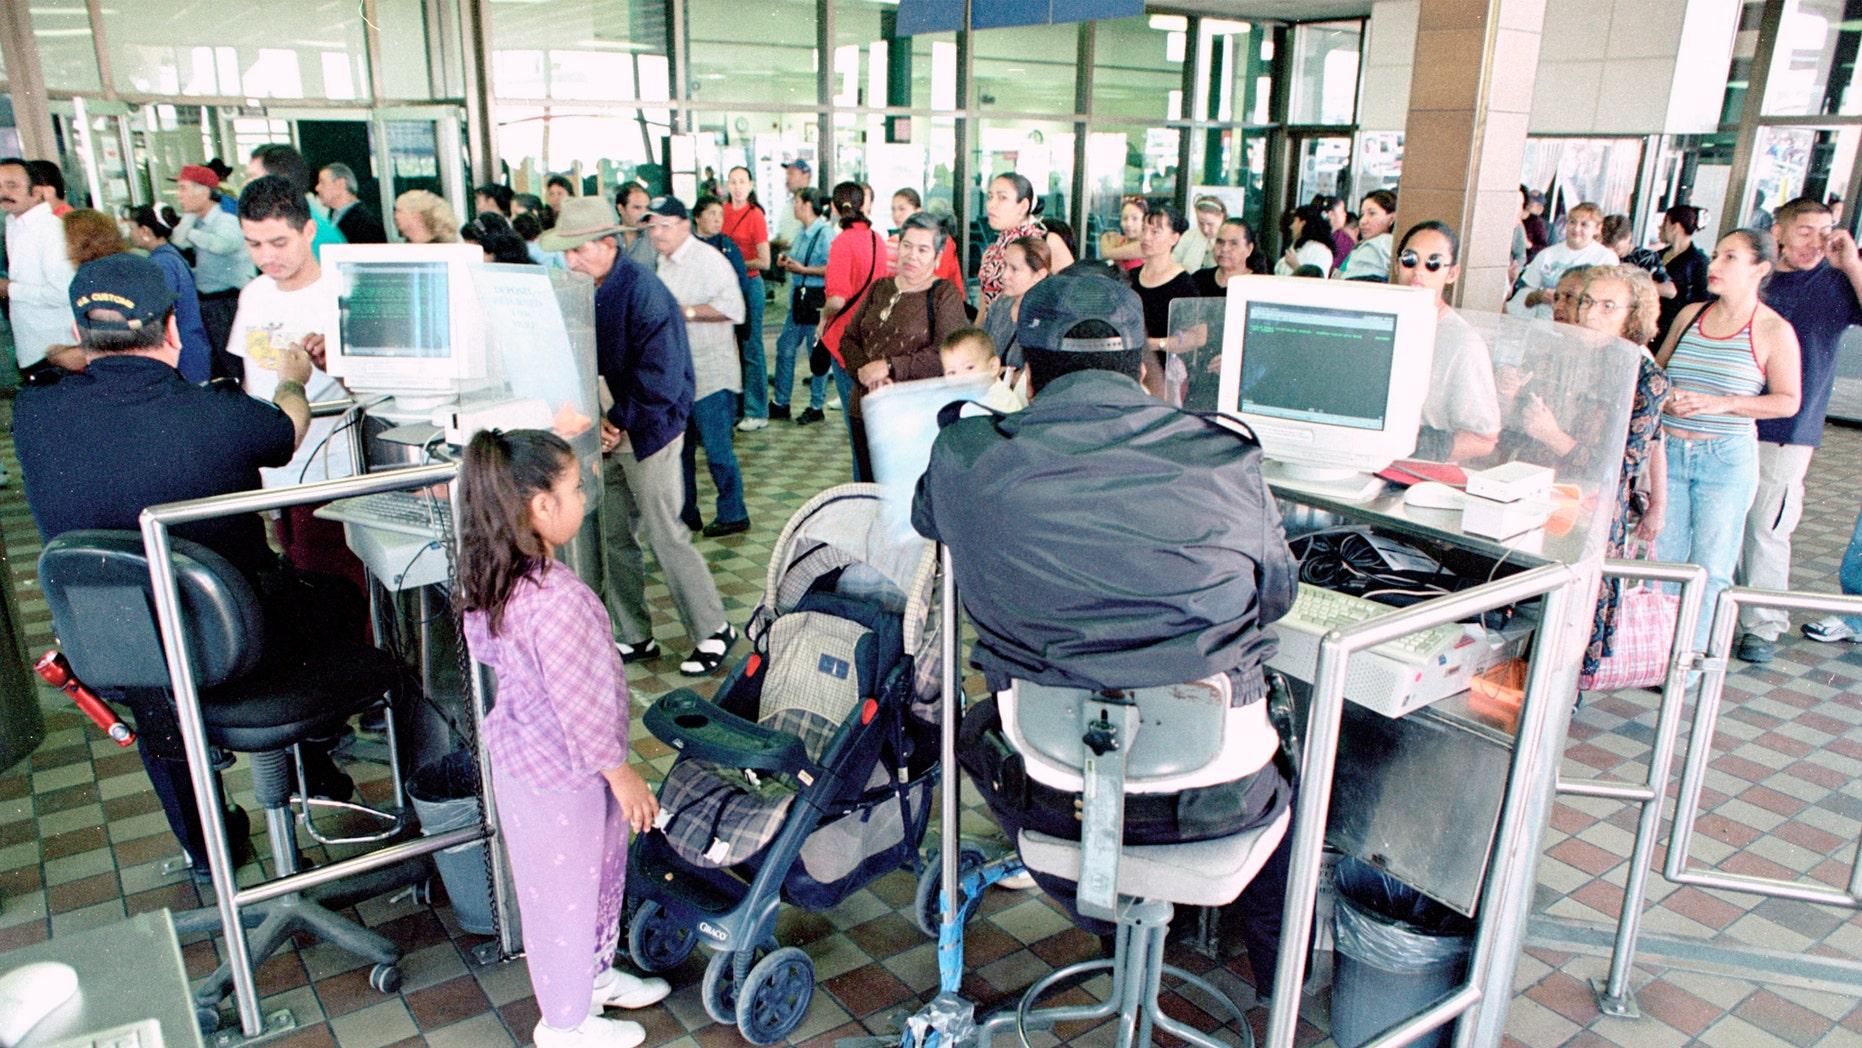 U.S. Customs Inspectors check identity papers at the Paso del Norte port of entry in El Paso, TX.